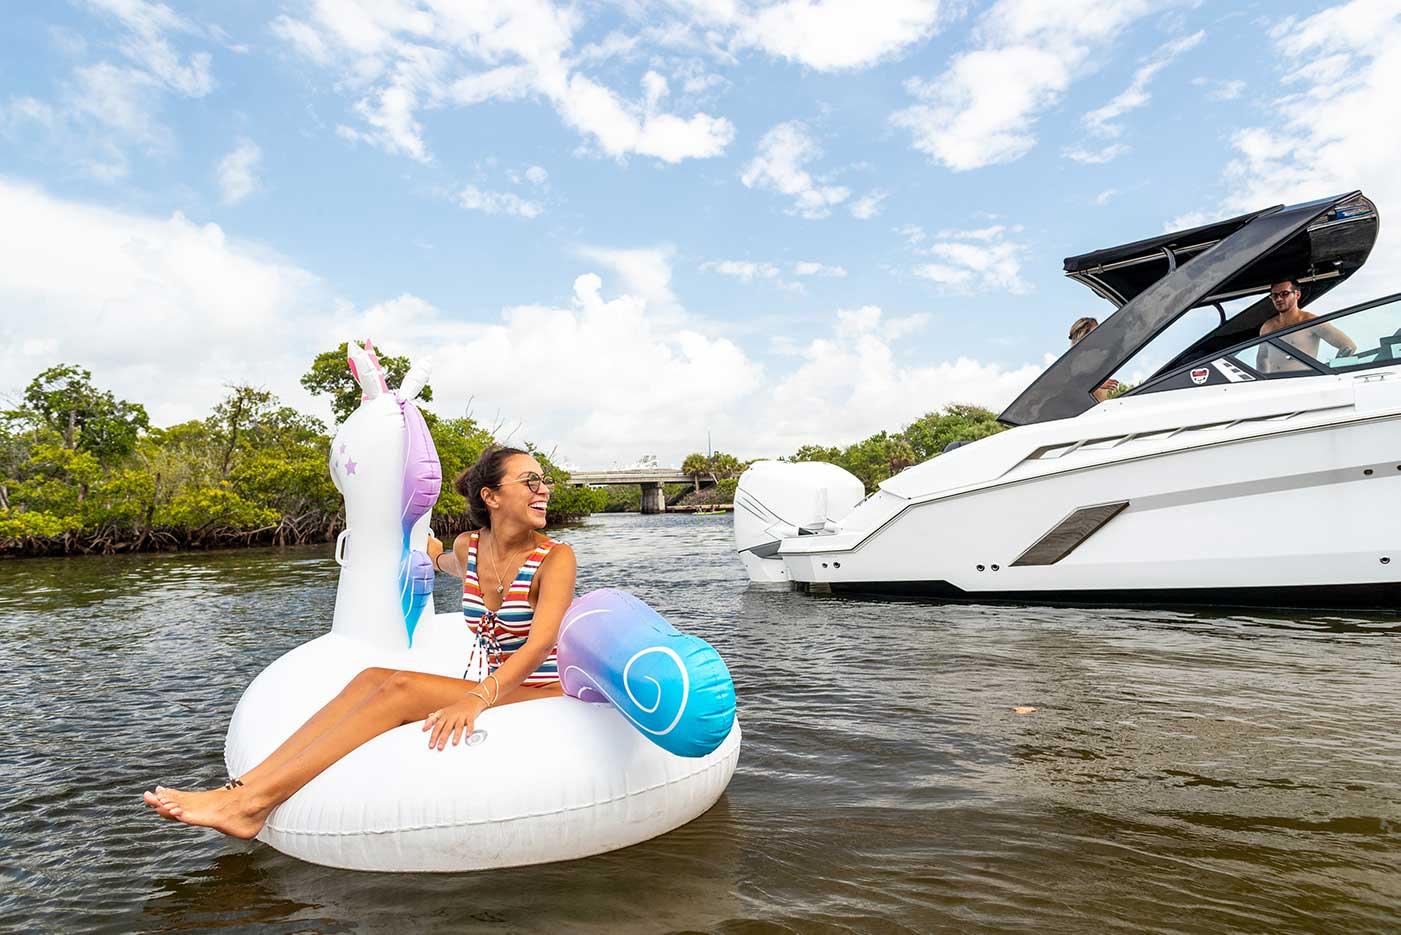 girl sitting on inflatable unicorn floating next to boat